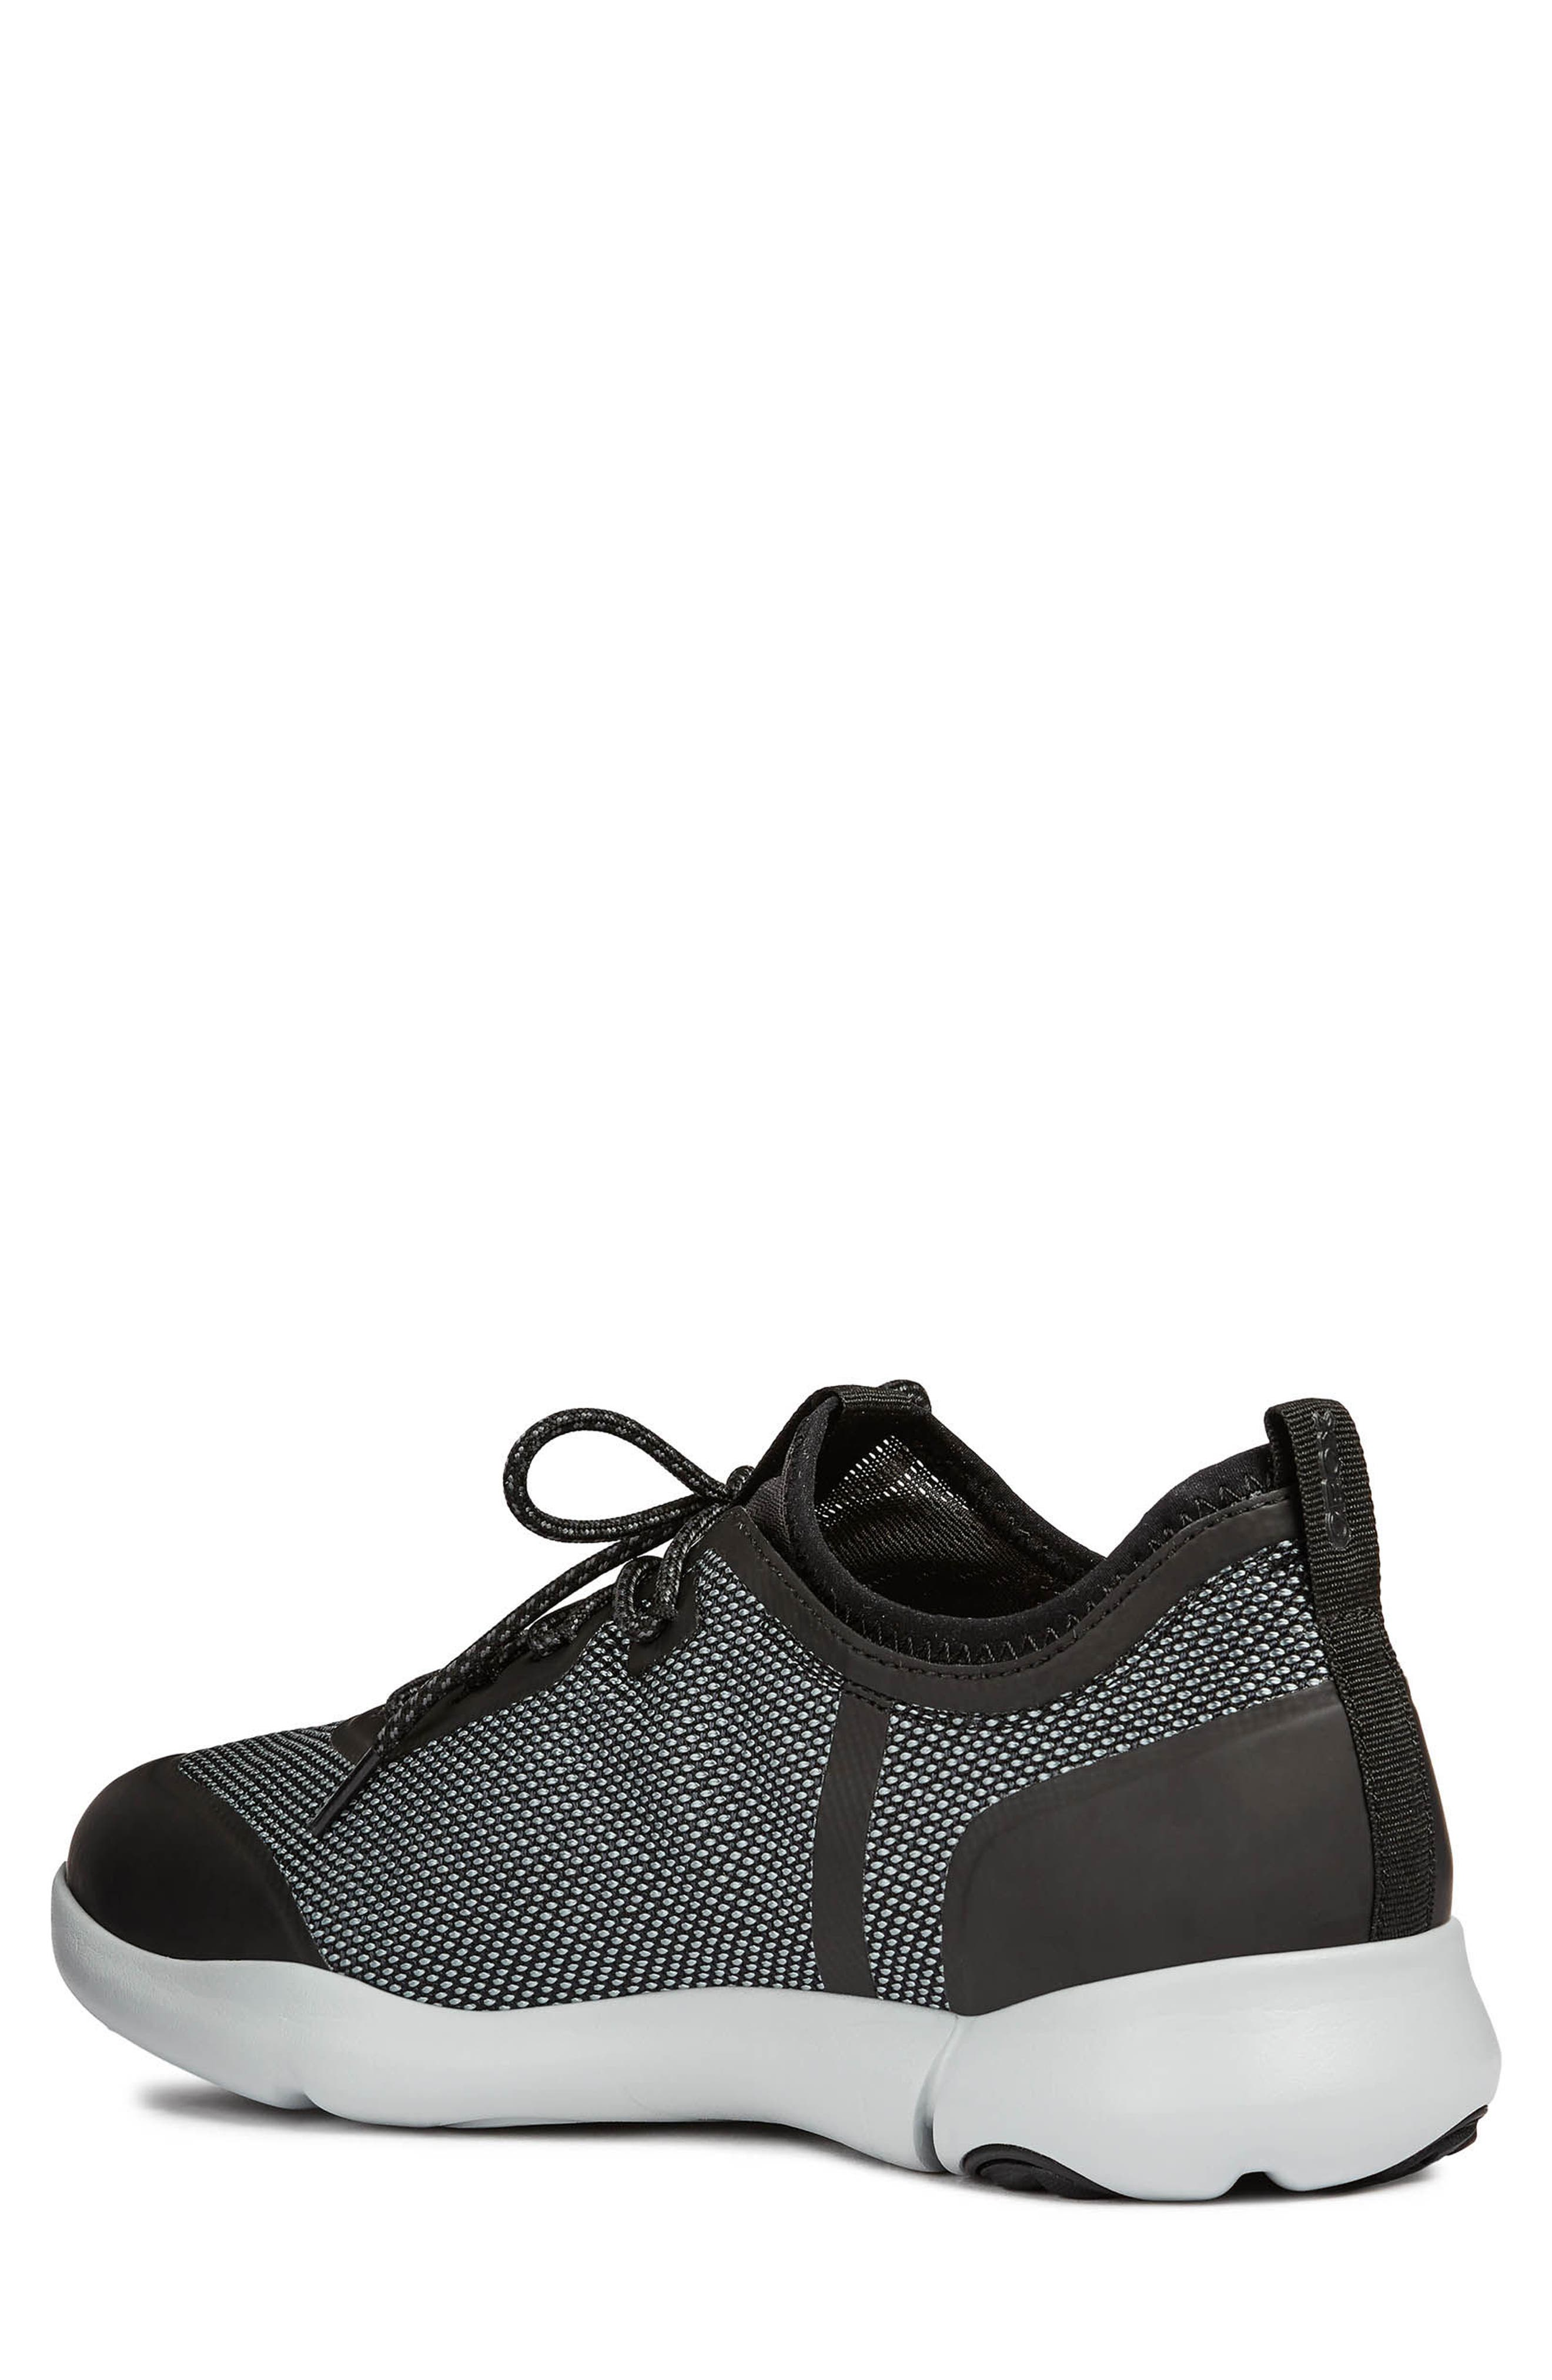 Nebula X 3 Low Top Sneaker,                             Alternate thumbnail 2, color,                             BLACK LEATHER